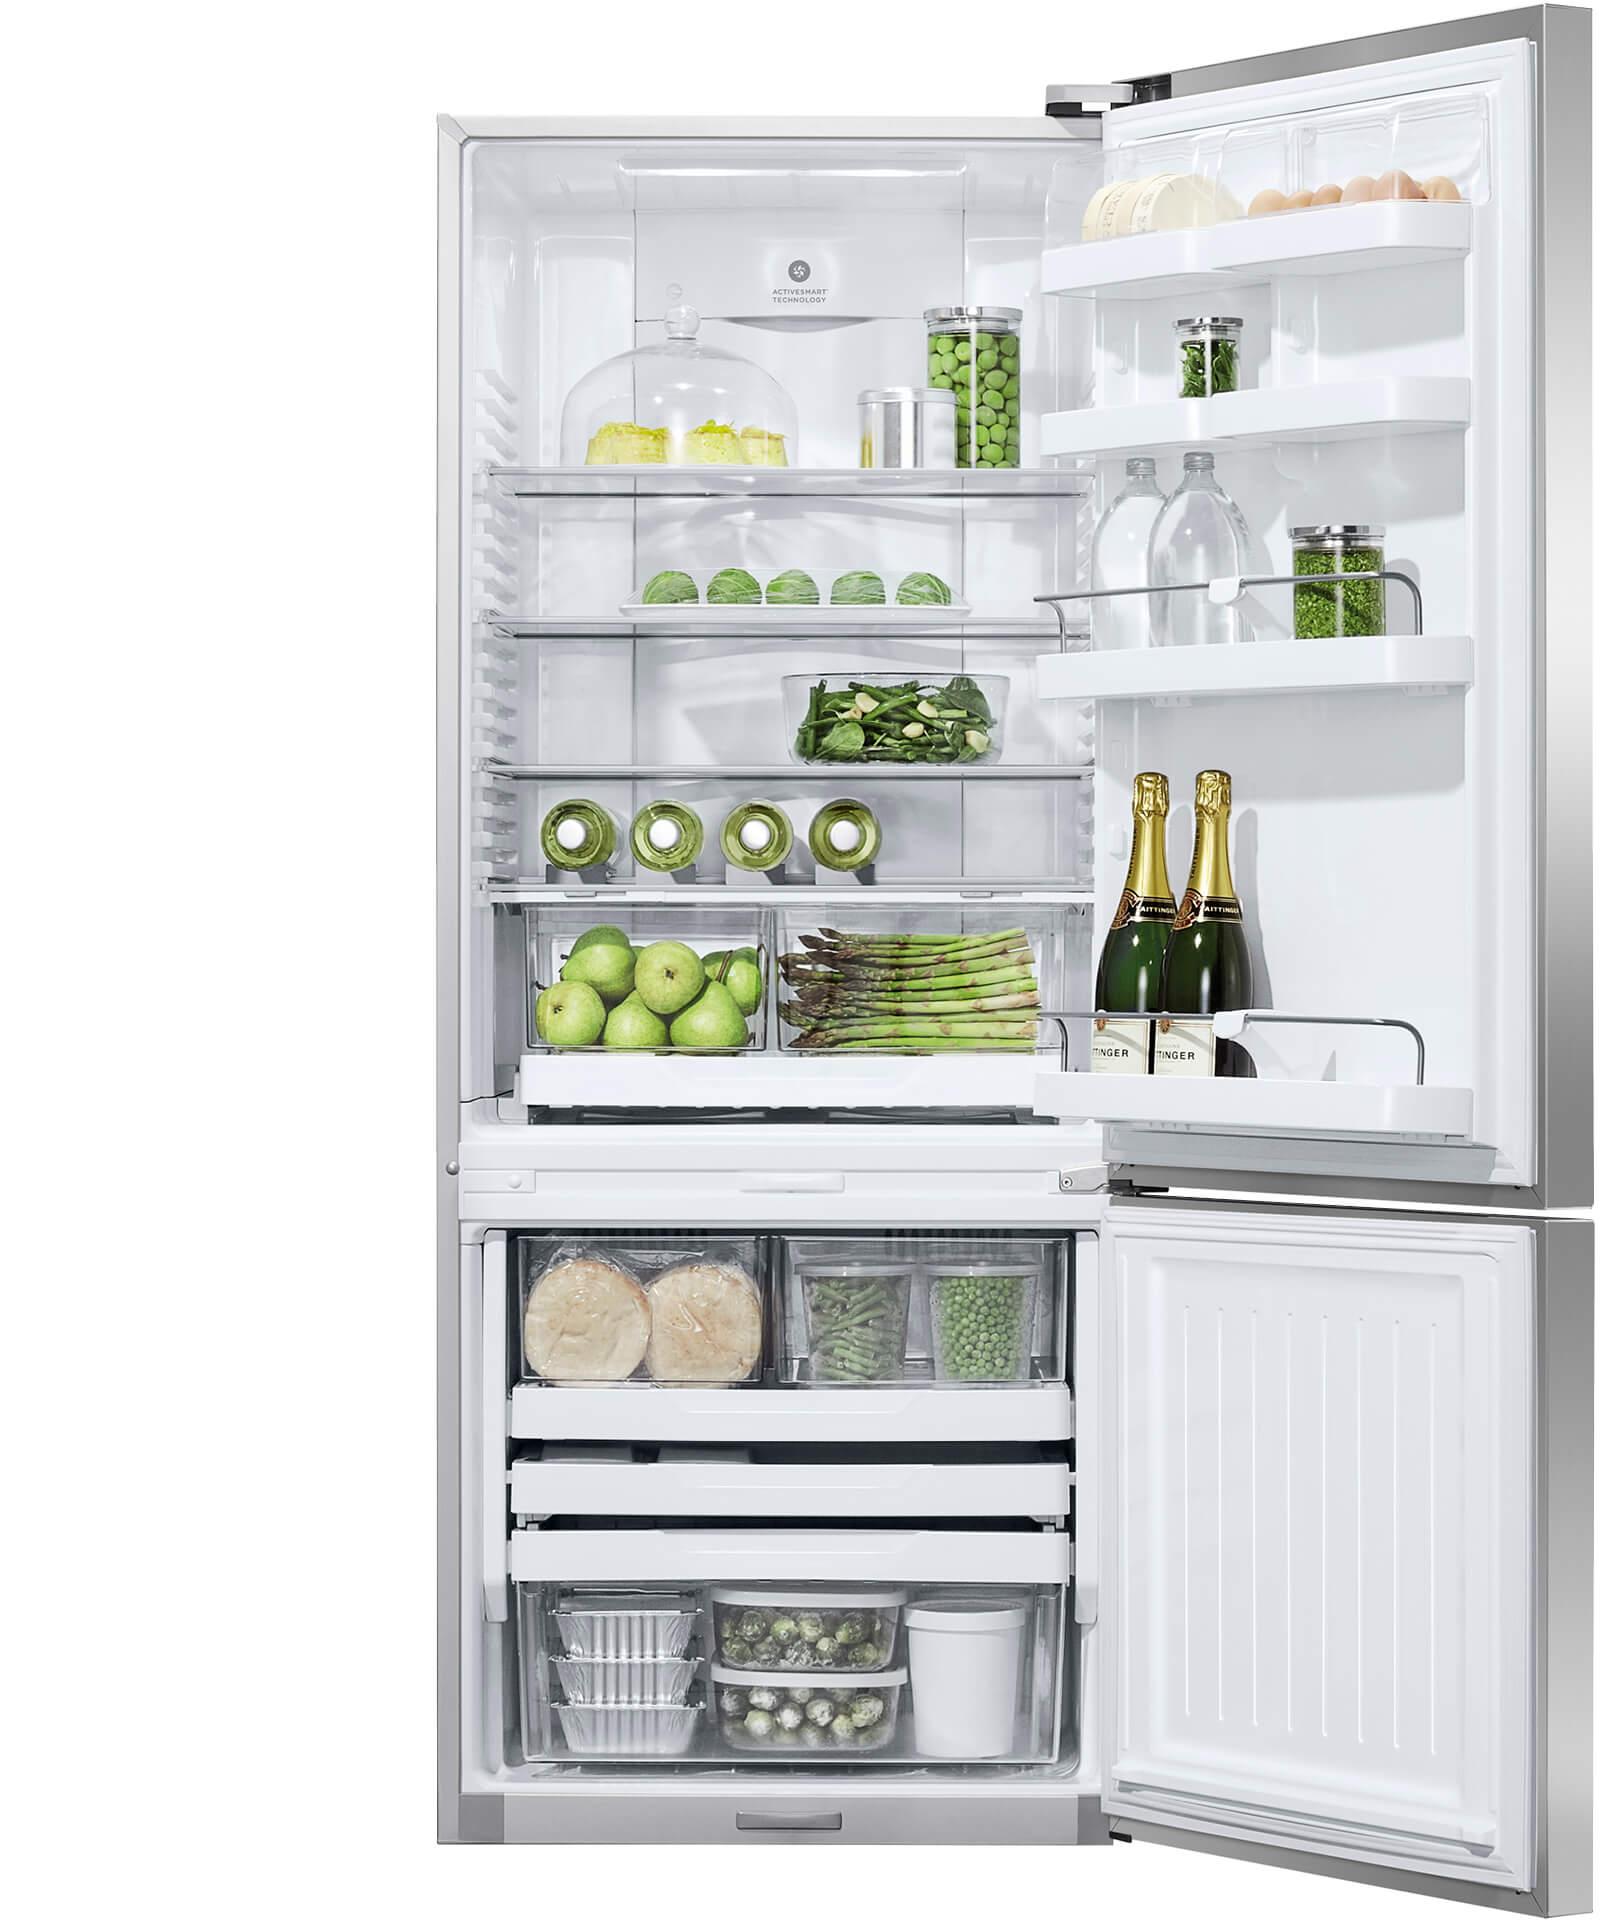 E442brxfd5 Activesmart Fridge 680mm Bottom Freezer 442l